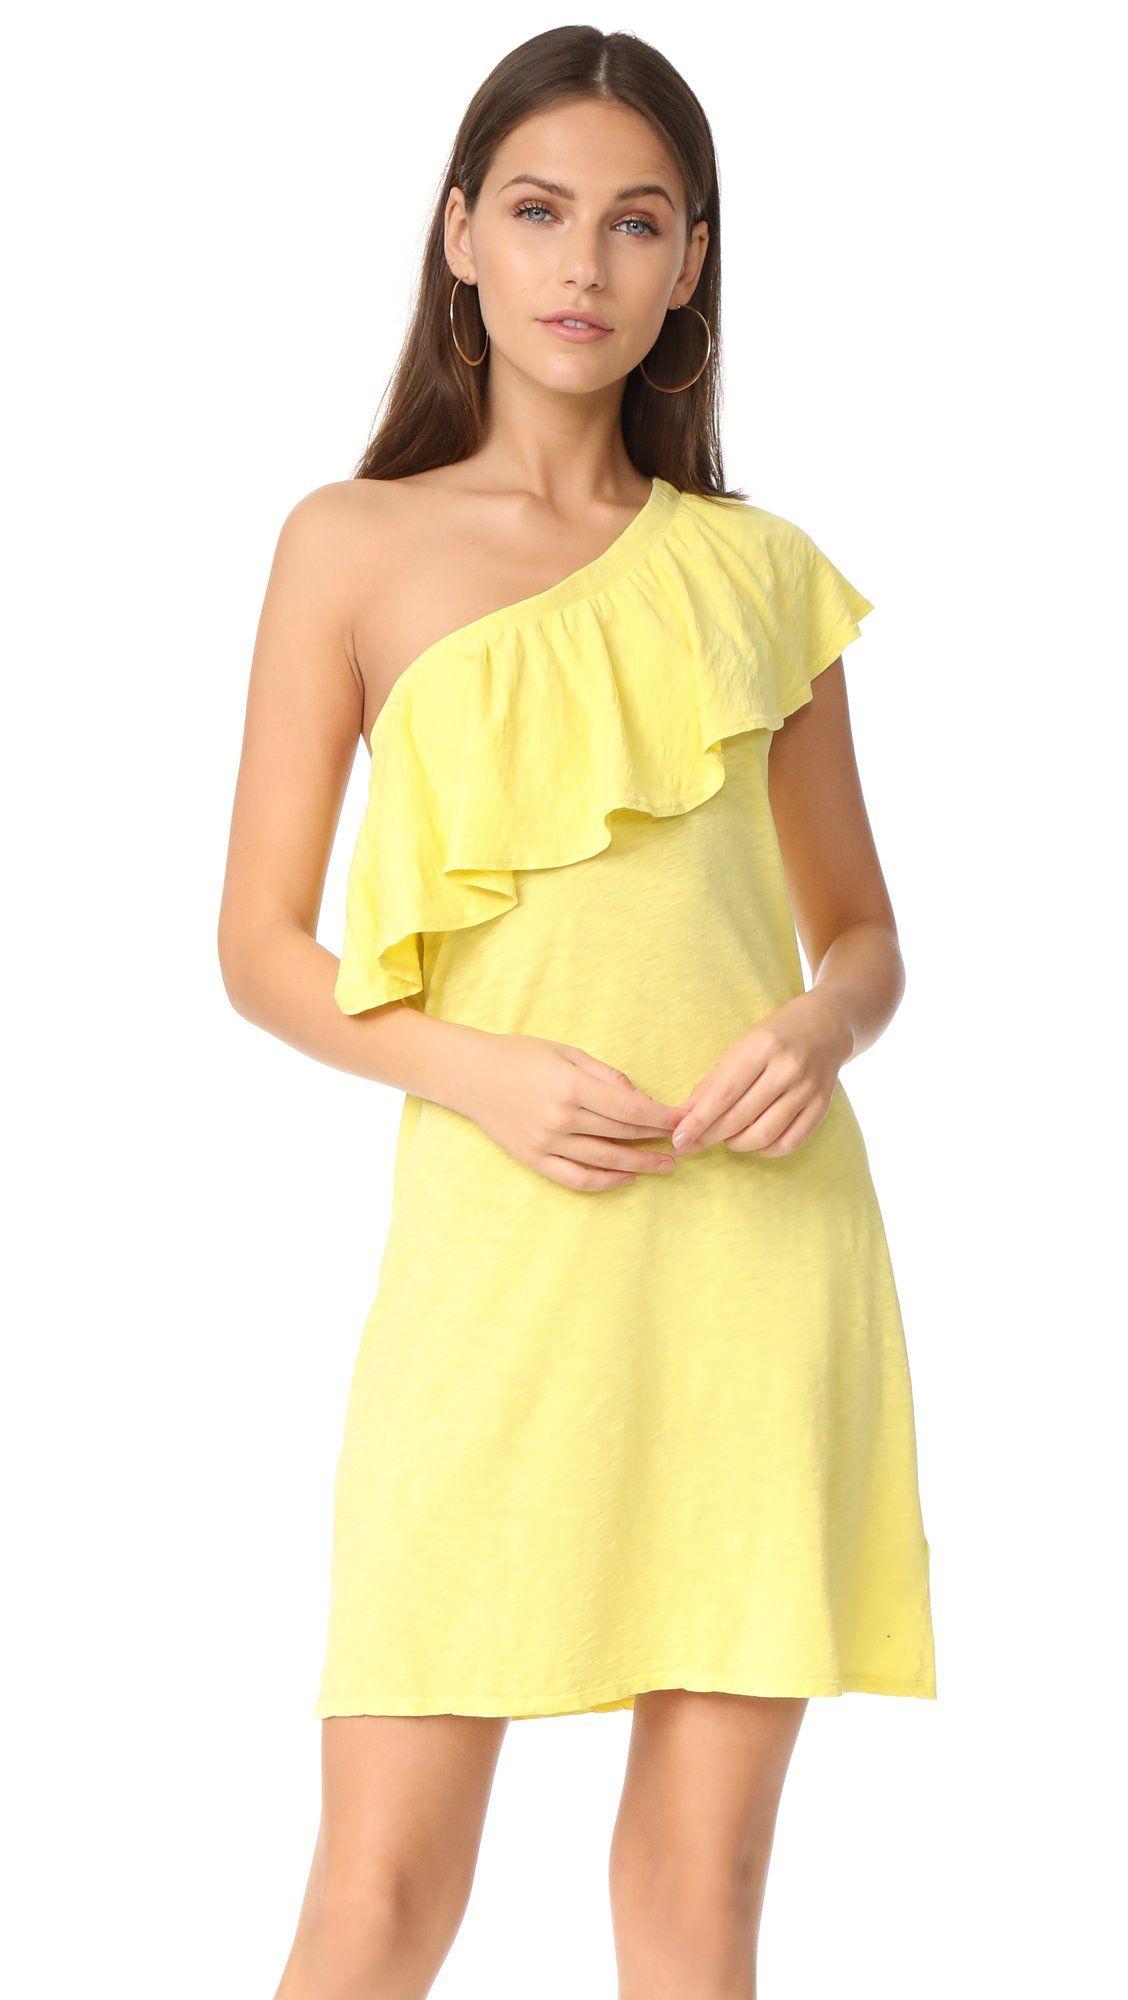 Velvet by graham u spencer womenus cotton slub one shoulder dress